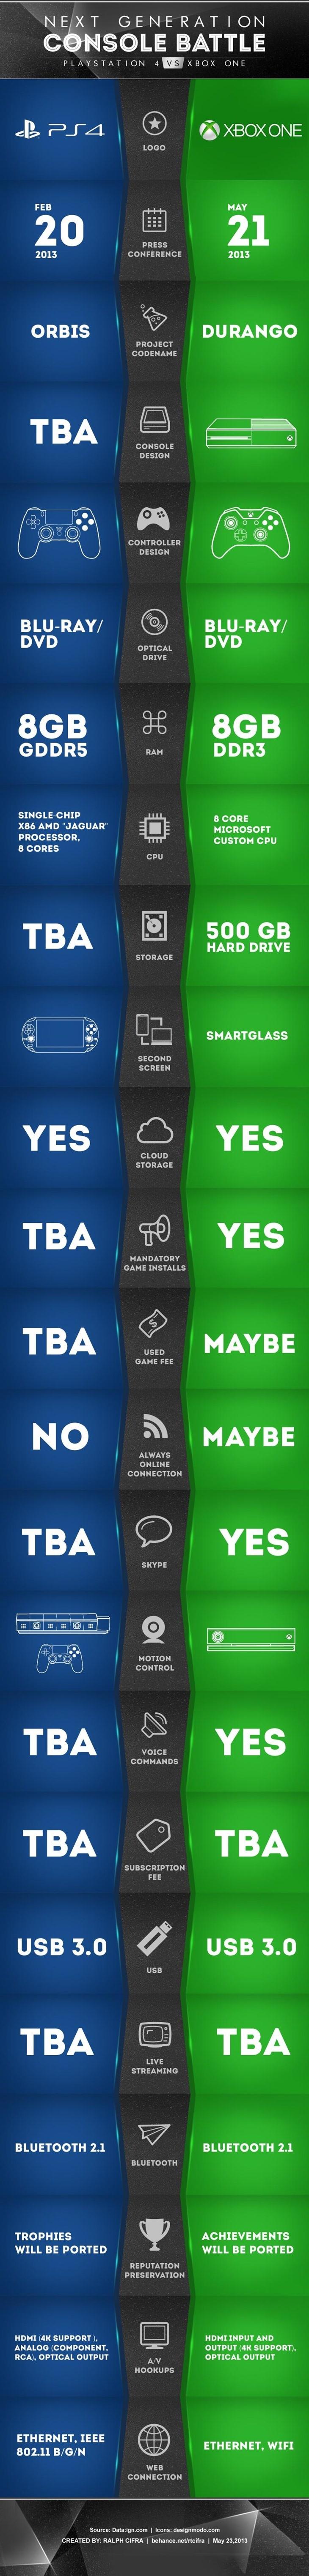 xbox_One_vs_PS4_Infographic